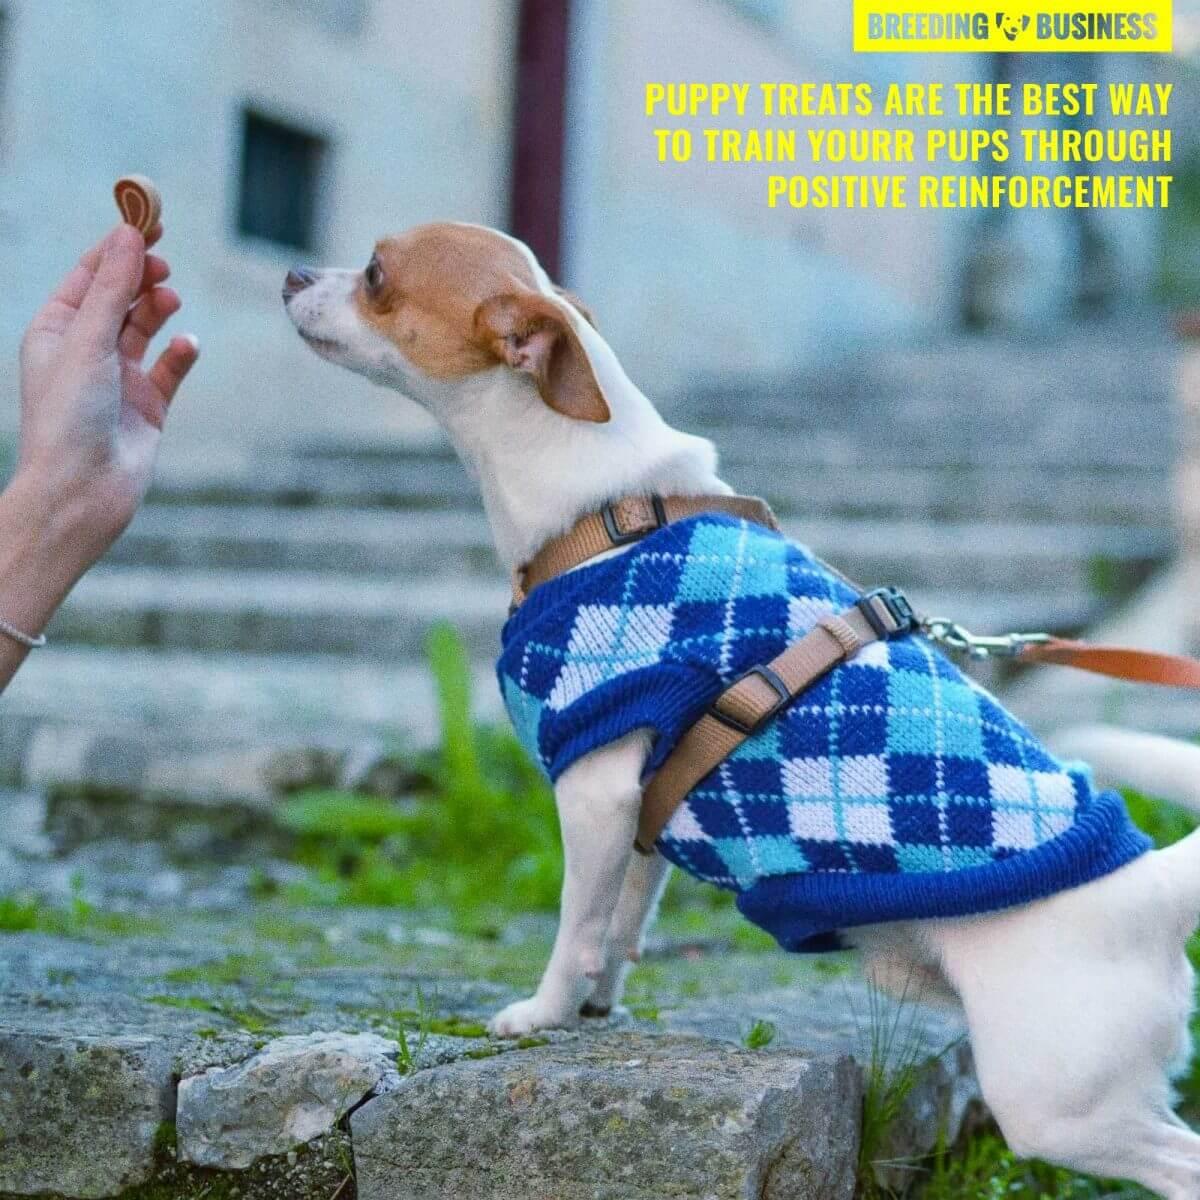 puppy treats for positive reinforcement